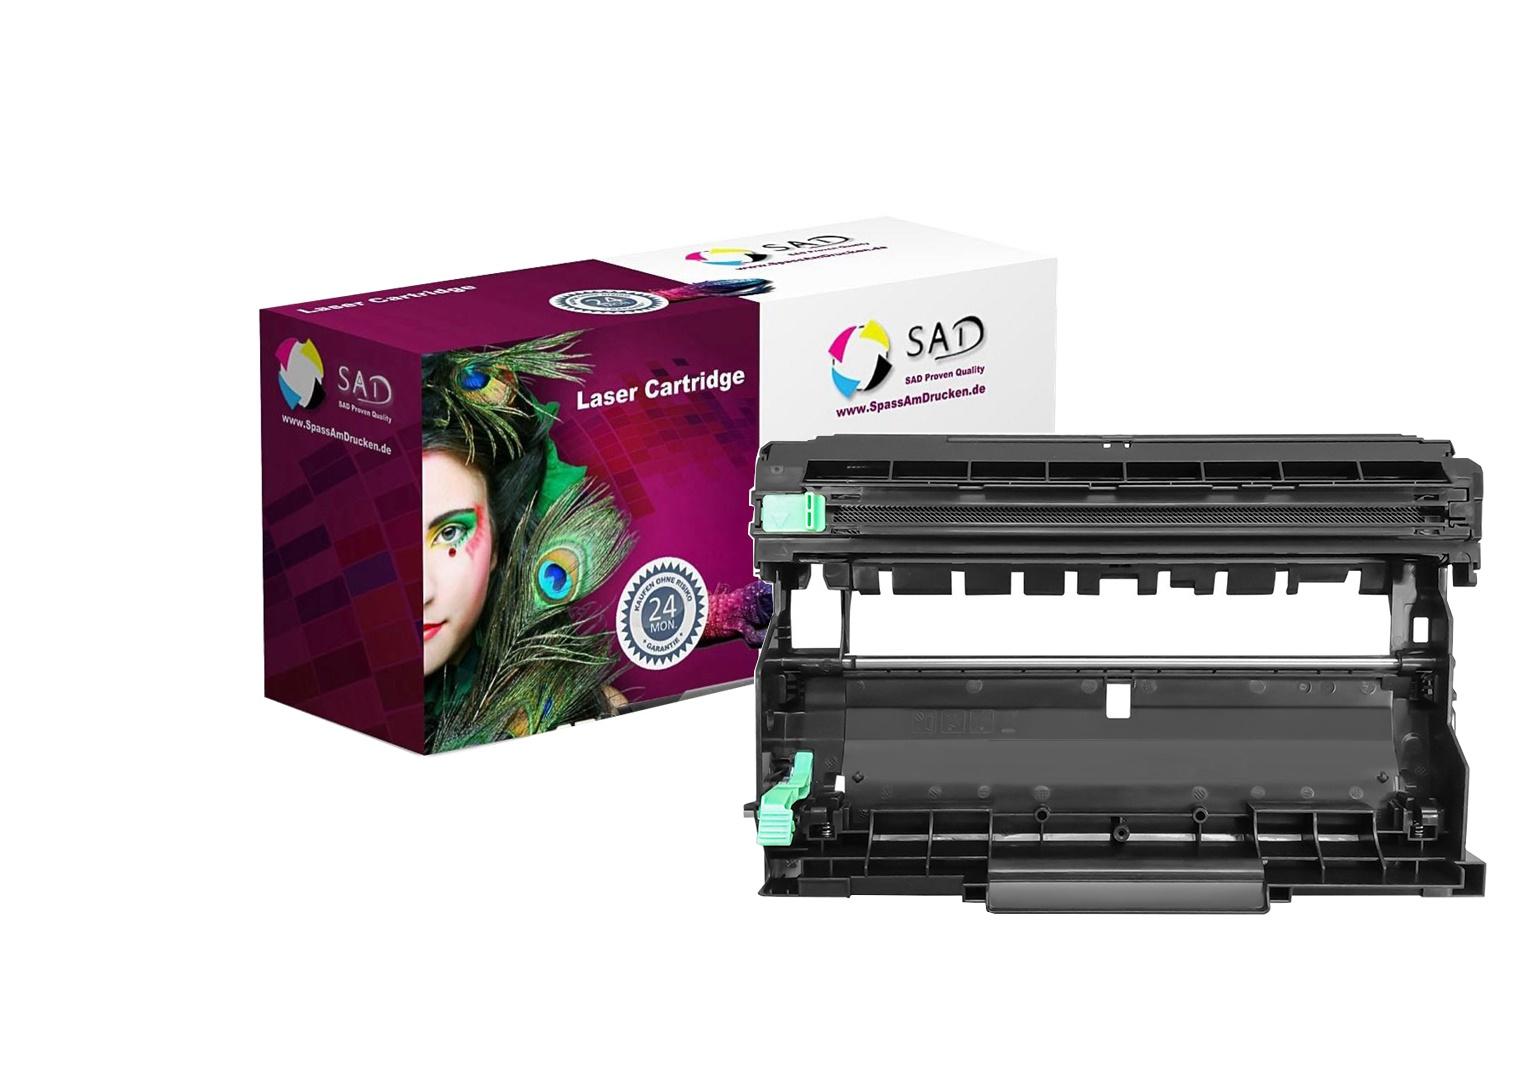 SAD Premium Trommel komp. mit Brother DR-2400 schwarz/black für DCP-L2510D, HL-L2370DN etc.